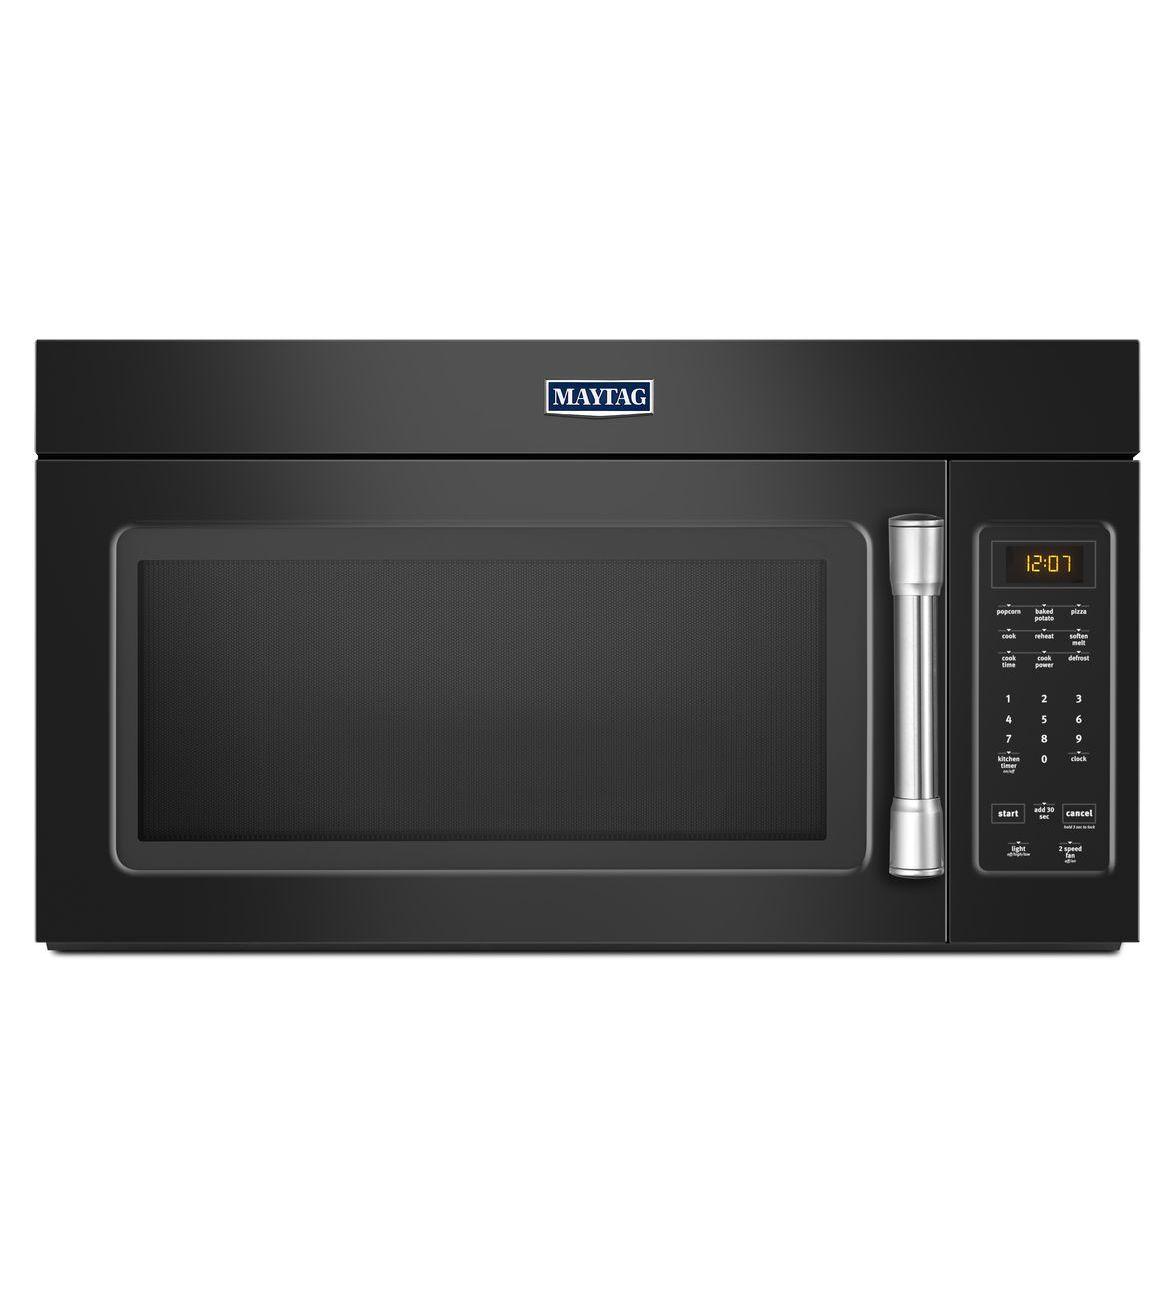 maytag microwave oven breville microwaves built in ovens. Black Bedroom Furniture Sets. Home Design Ideas